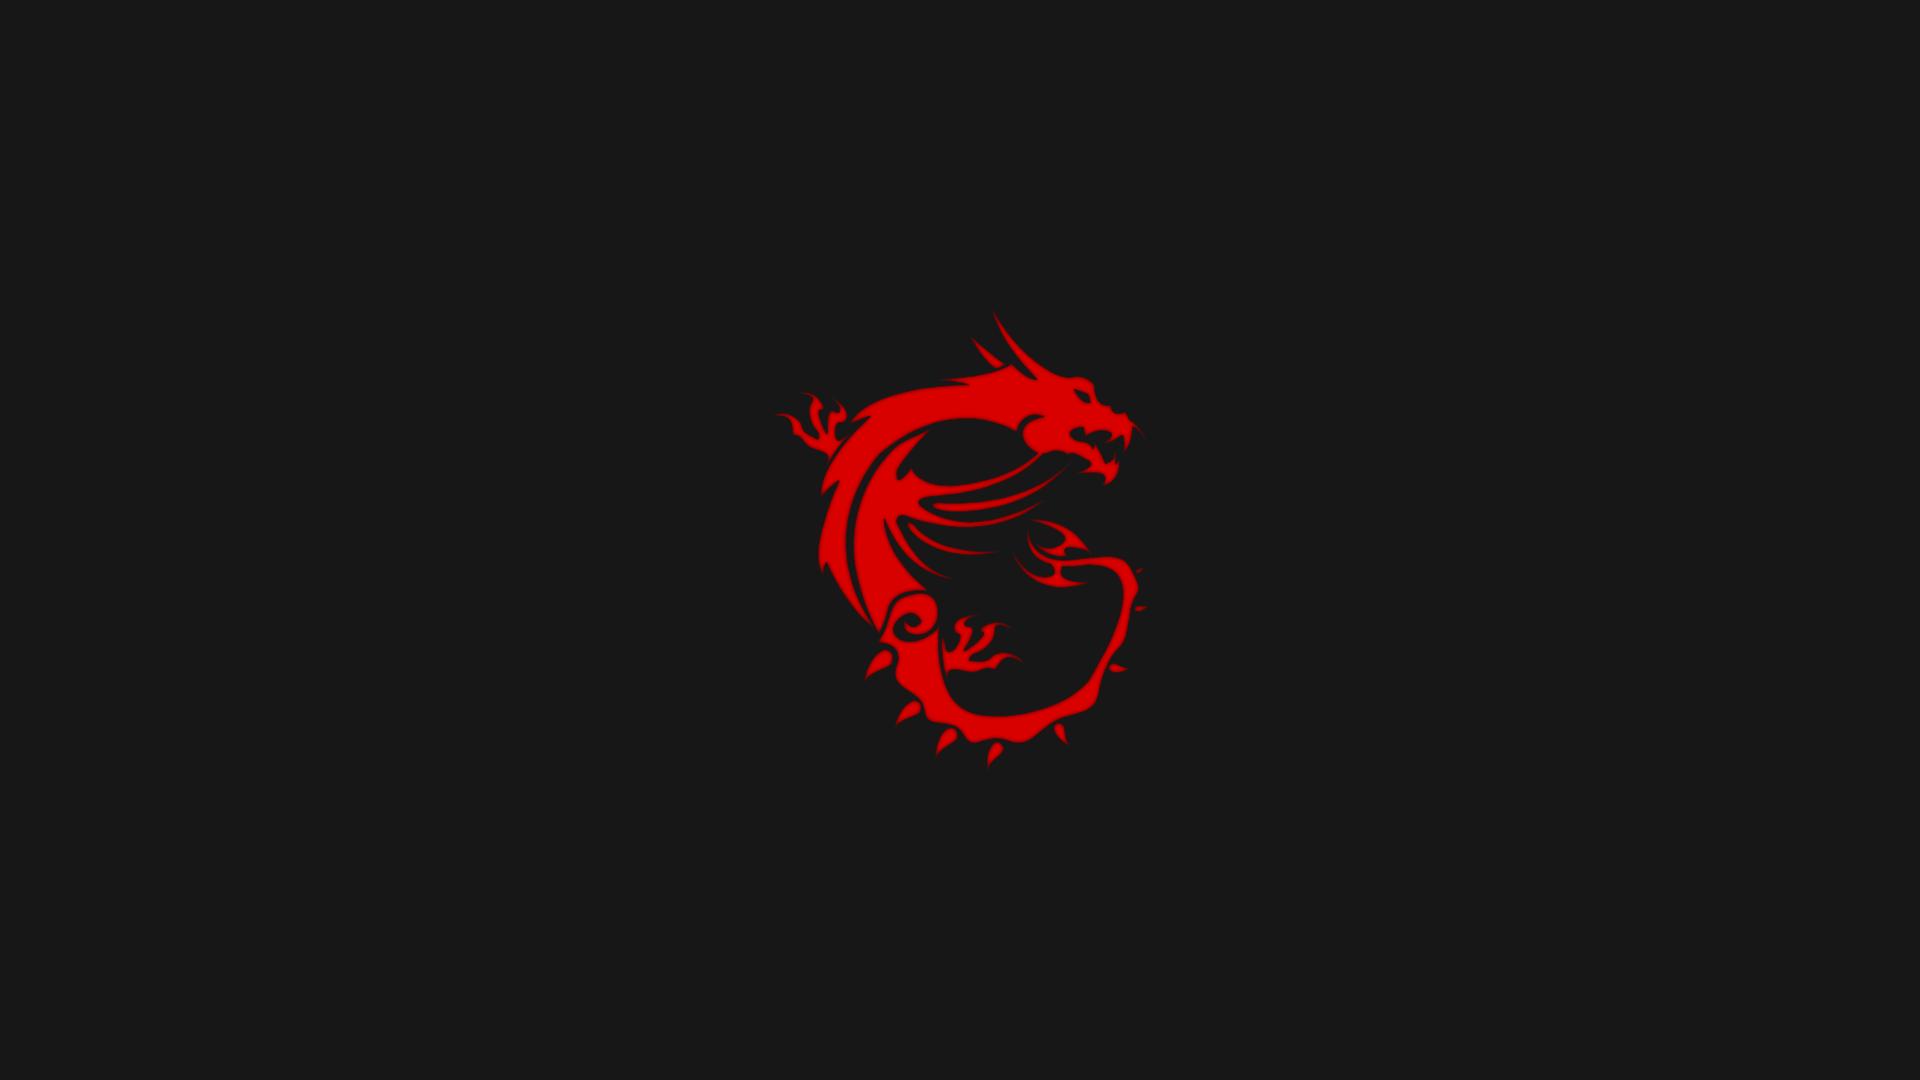 General 1920x1080 Msi Simple Minimalism Computer Logo Dragon Computer Logo Dragon Illustration Art Logo